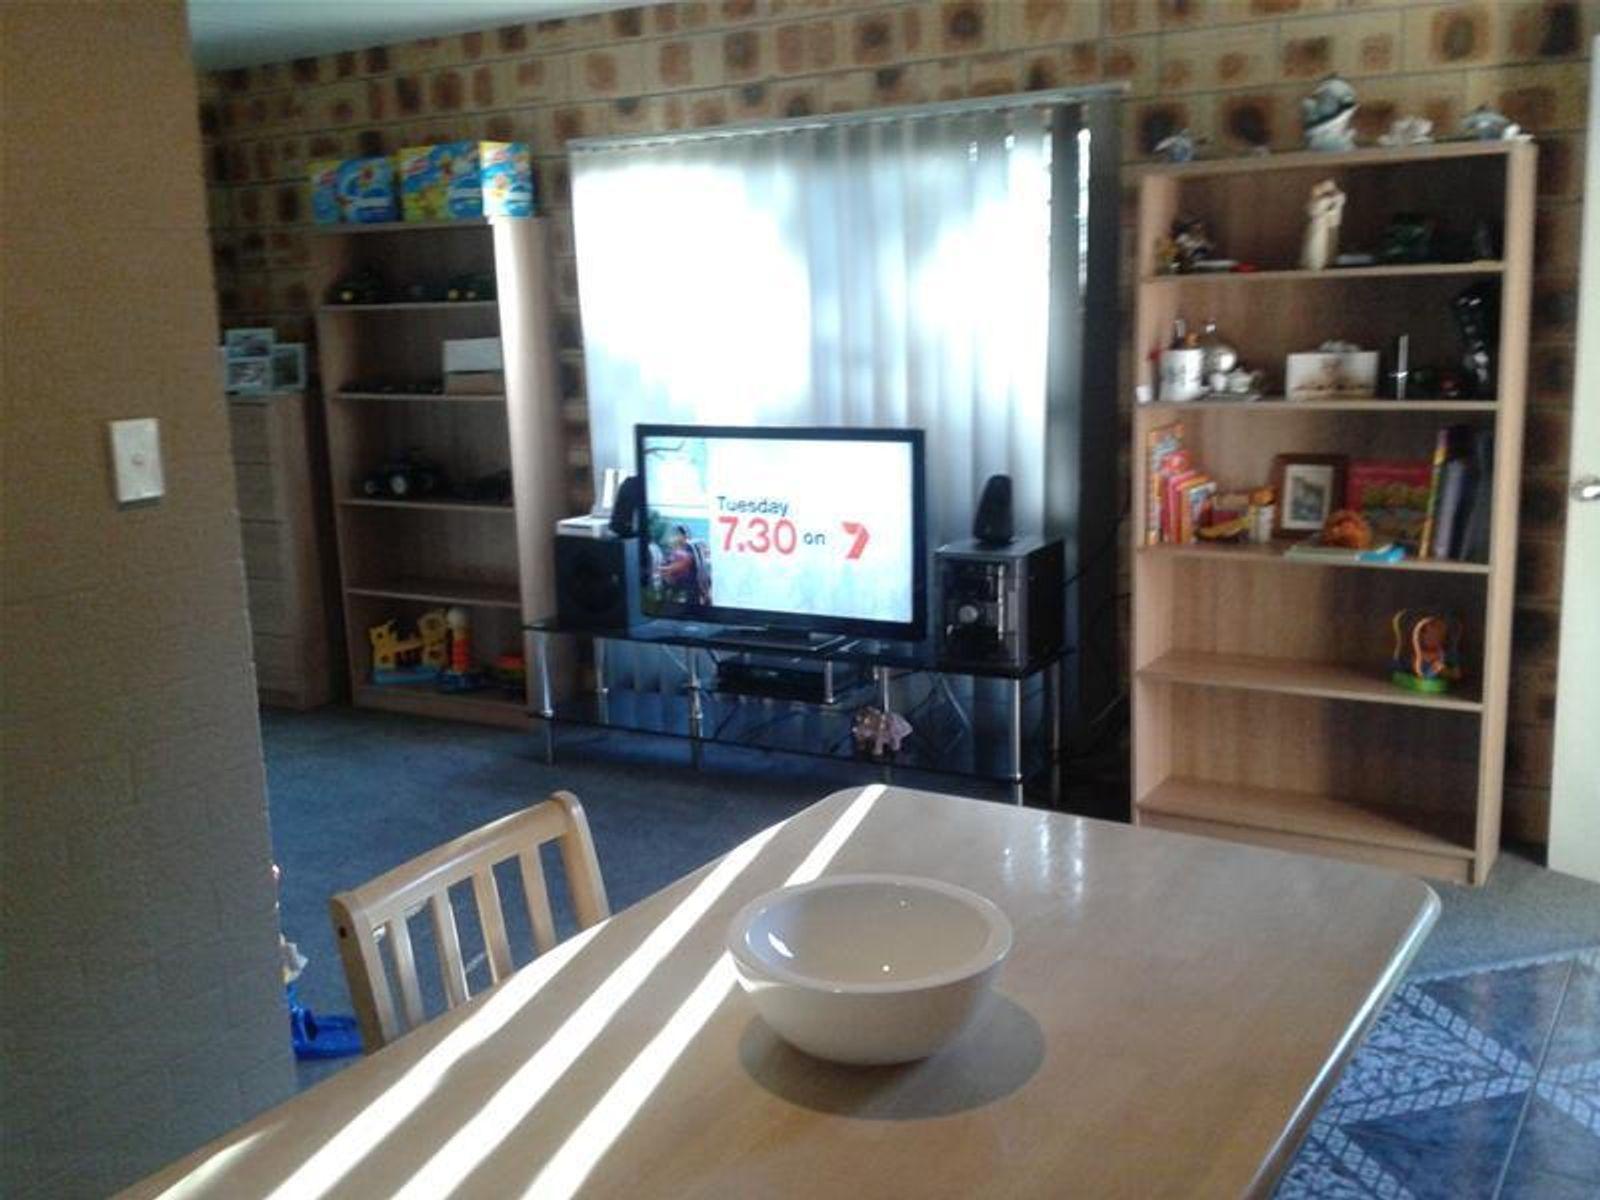 223 Back Electra Road, Electra, QLD 4670